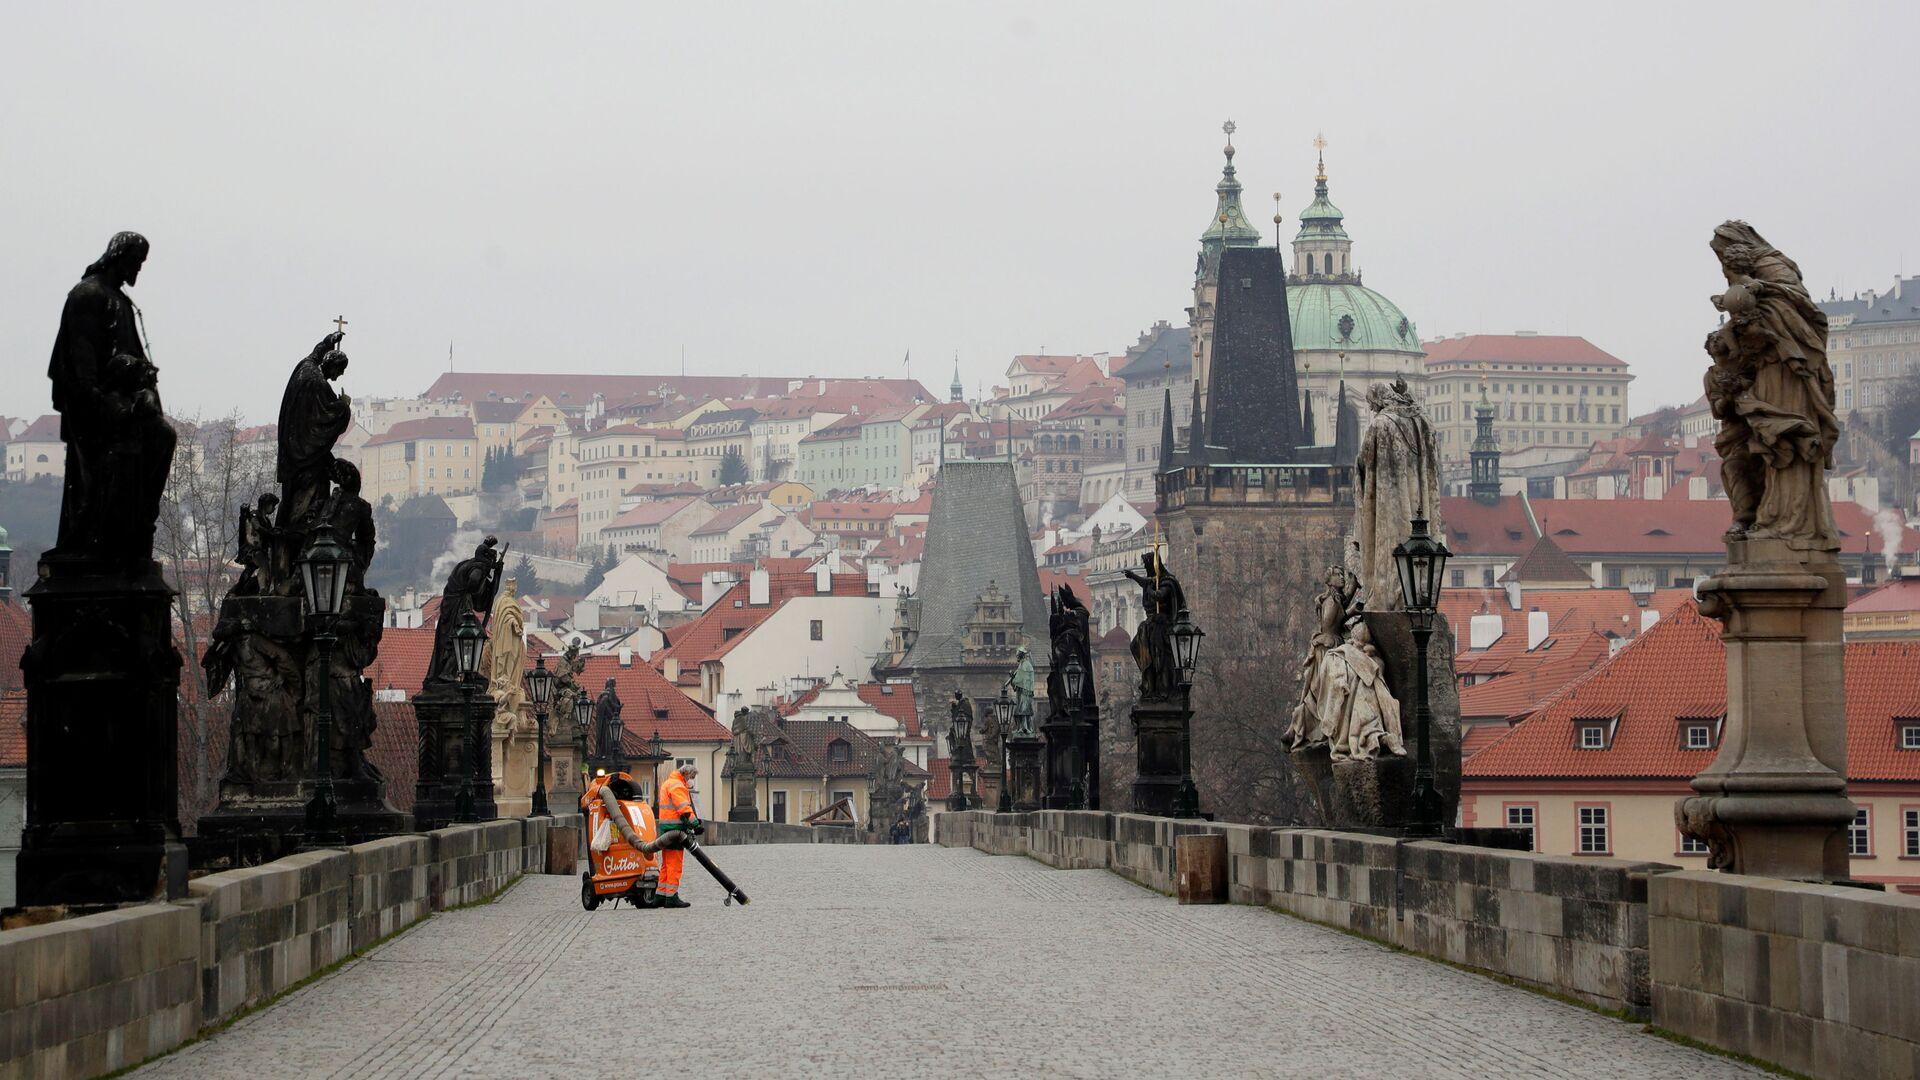 Praha, Karlův most - Sputnik Česká republika, 1920, 07.03.2021